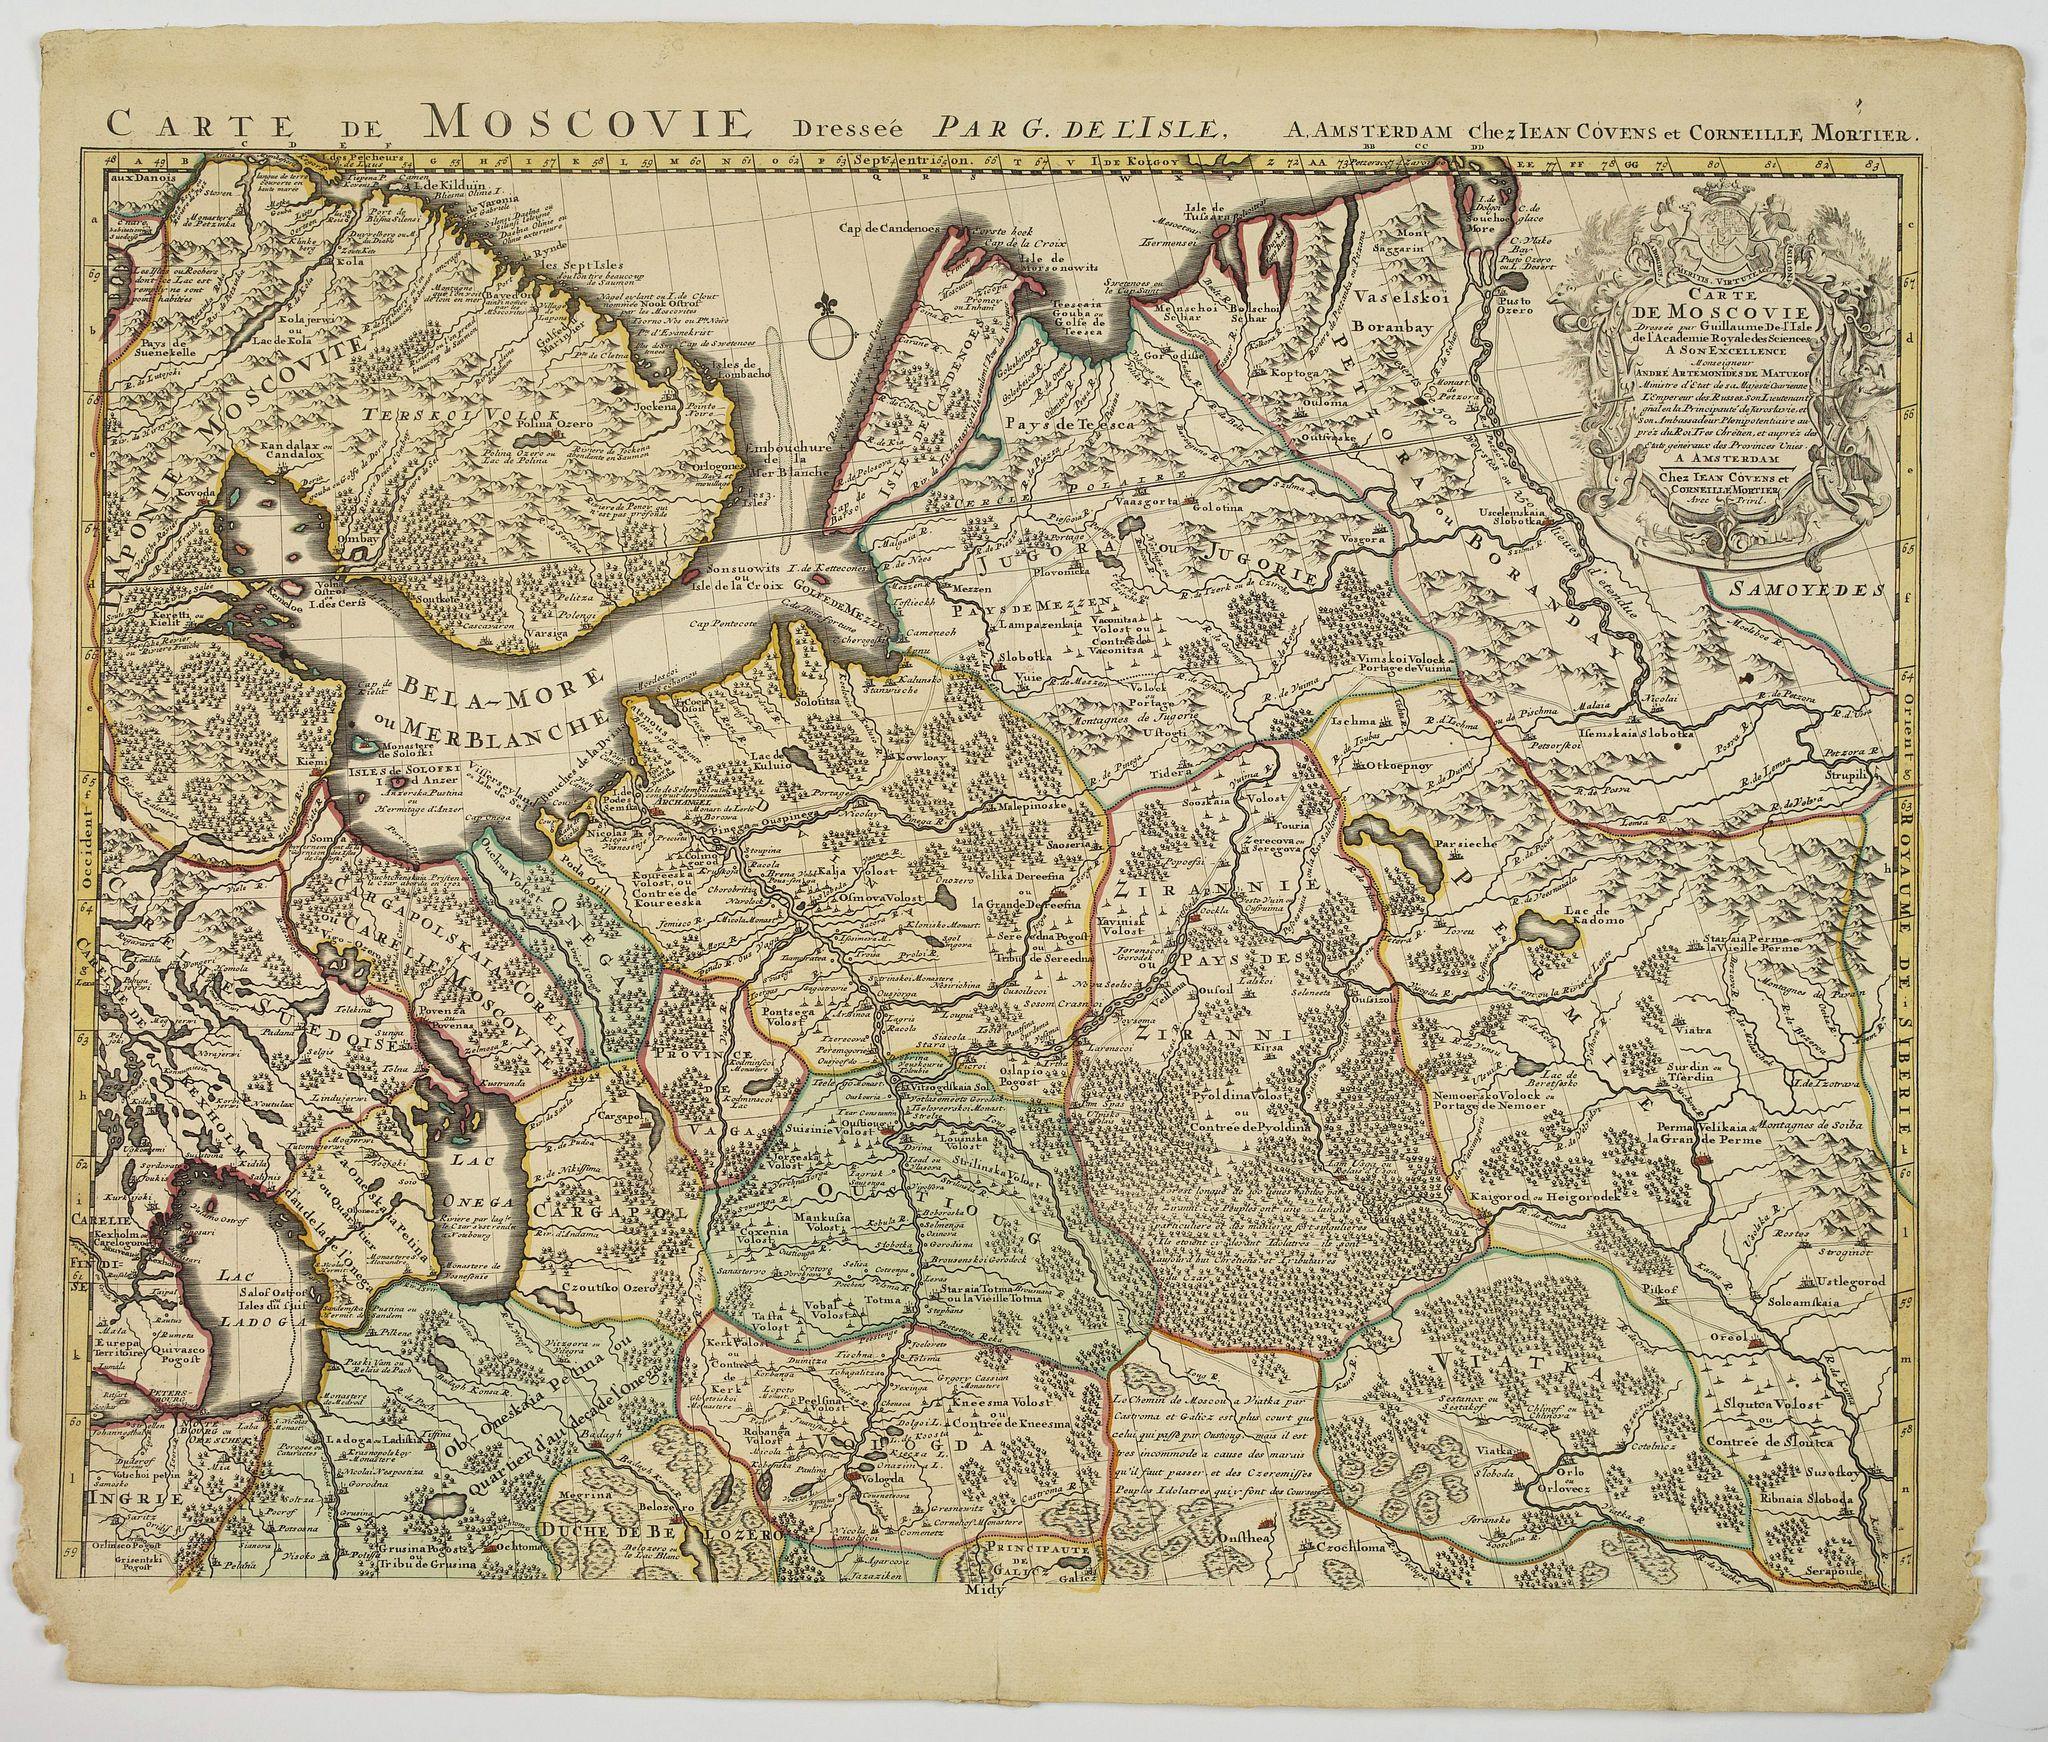 COVENS, J. / MORTIER, C. -  Carte de Moscovie dresseé par G.De L'Isle. . .